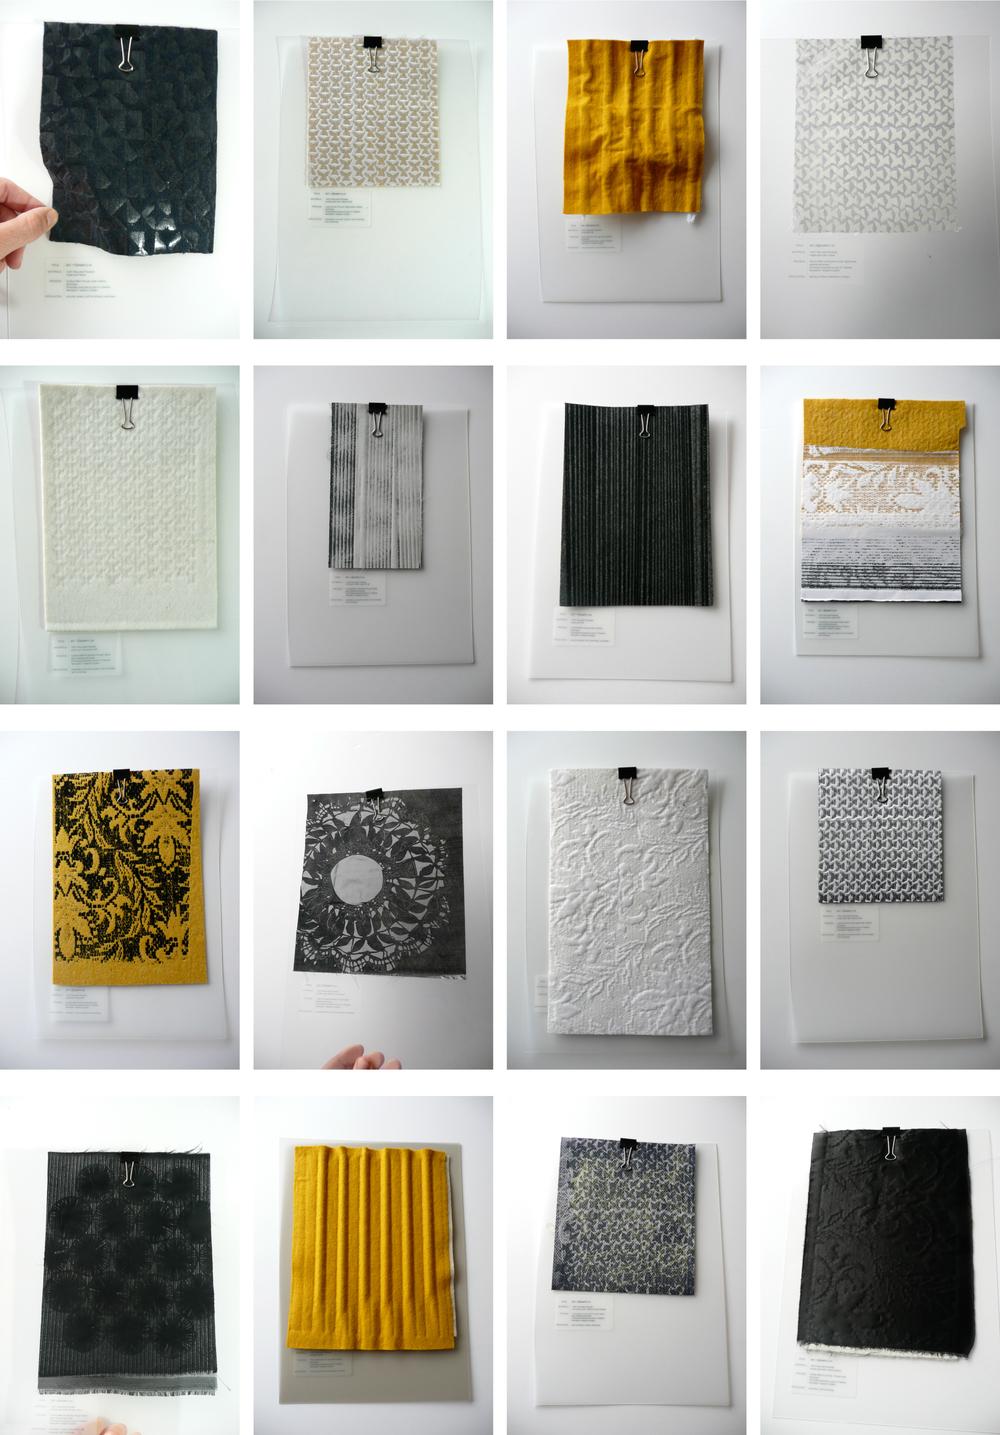 Mono Finishing - Goldsworthy (2009)